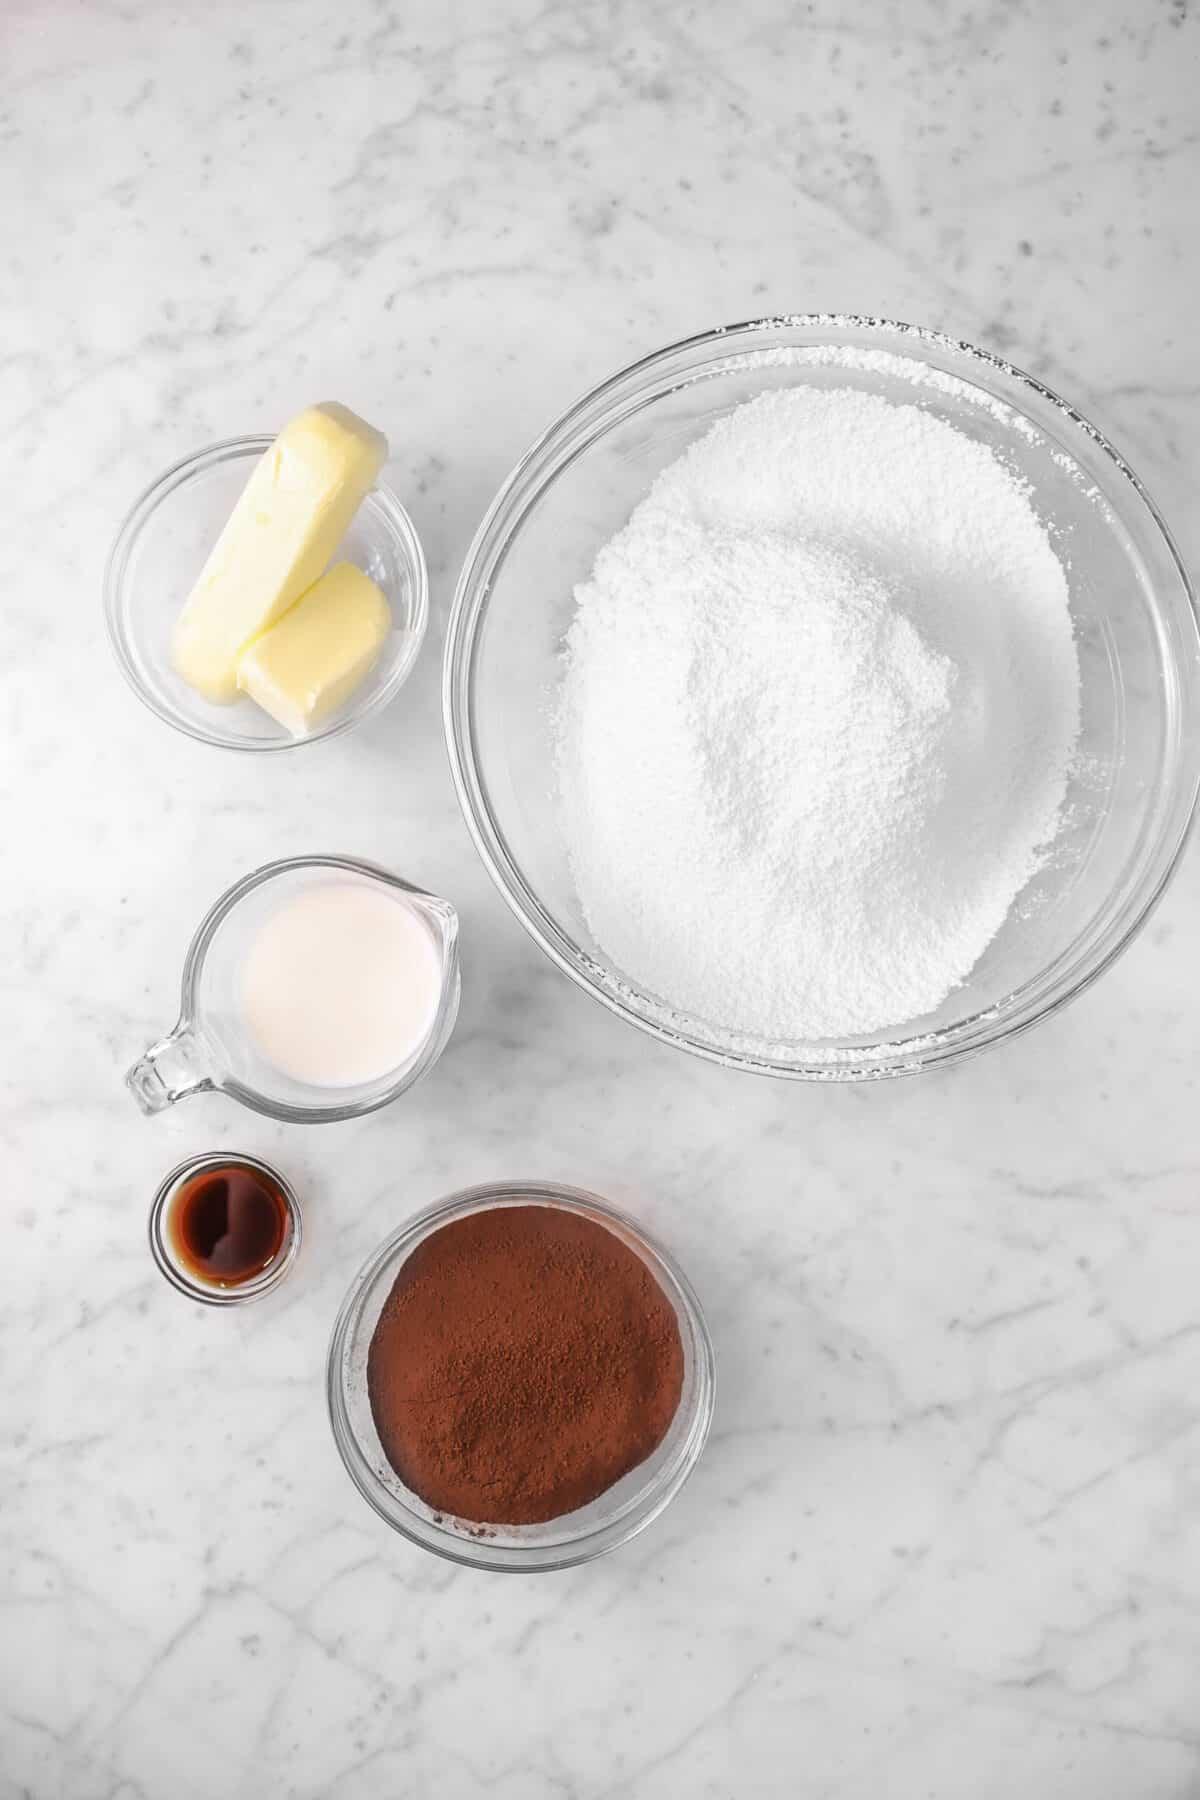 butter, milk, vanilla, cocoa powder, and powdered sugar on a counter